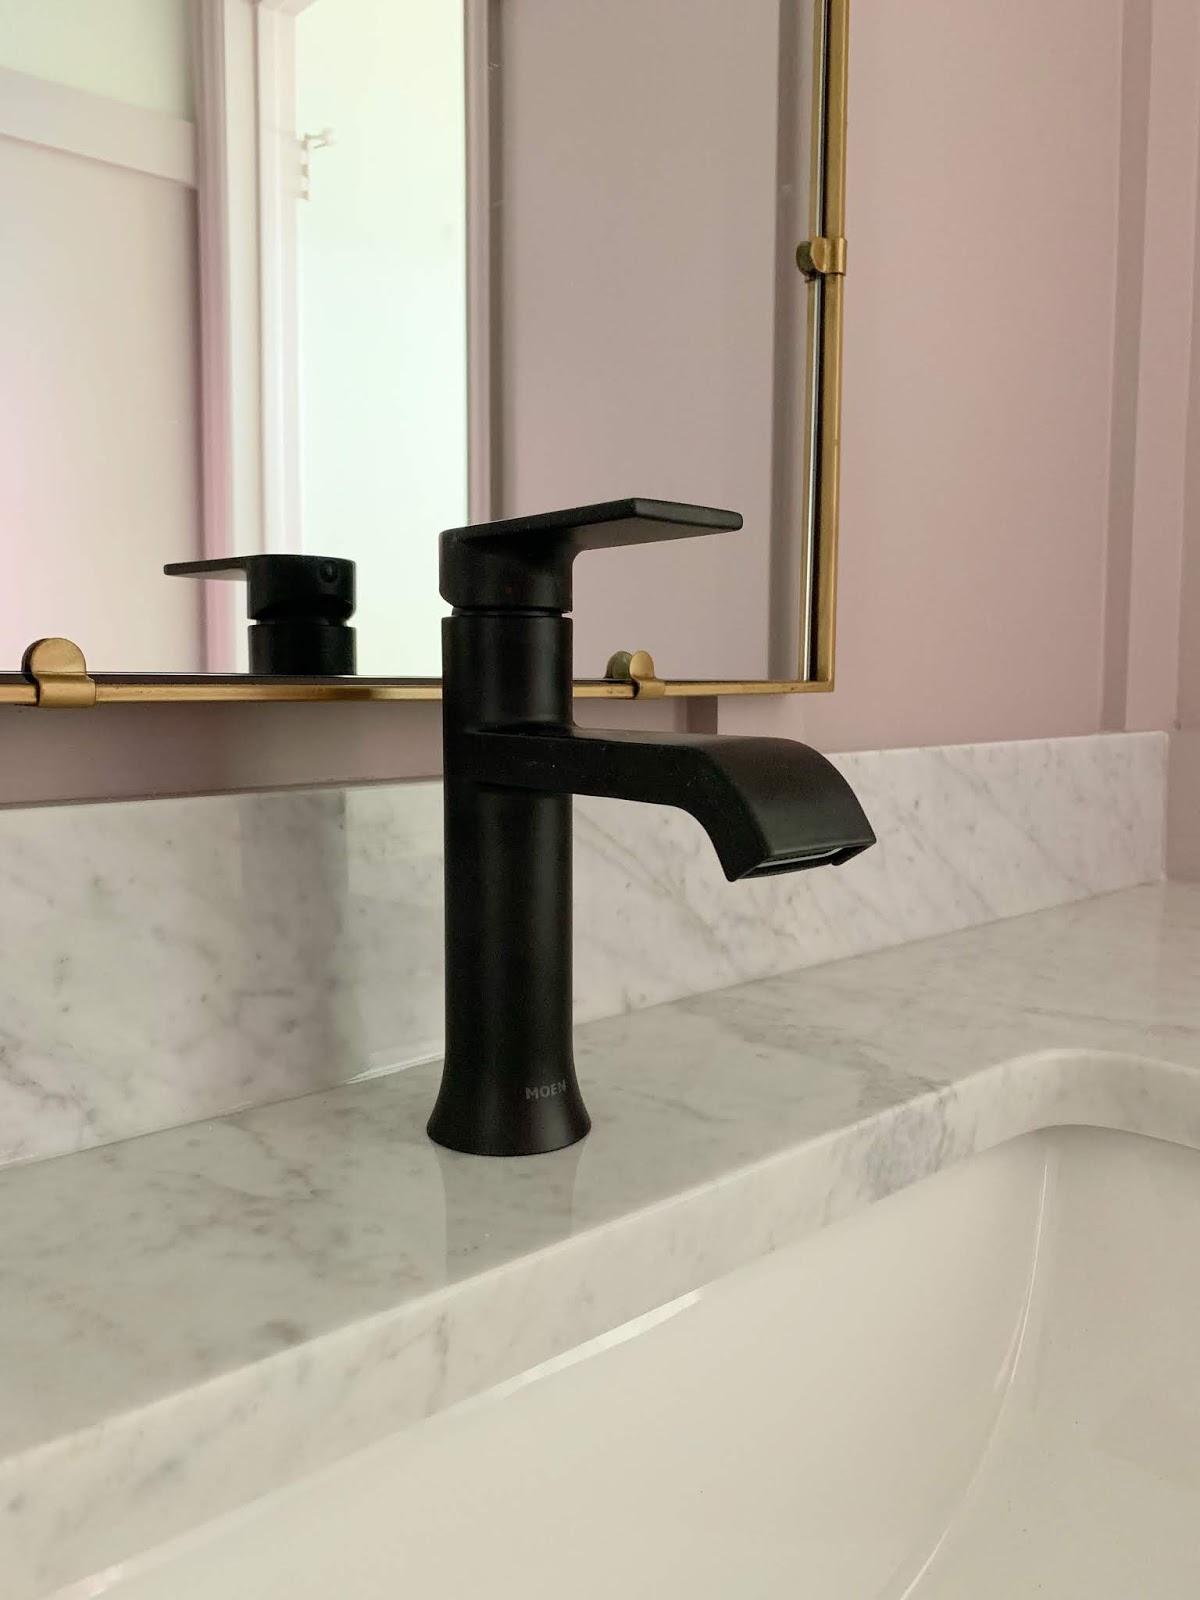 Moen genta faucet matte black | Primp and Pamper Bathroom Makeover sponsored by Signature Hardware and Build.com | House Homemade